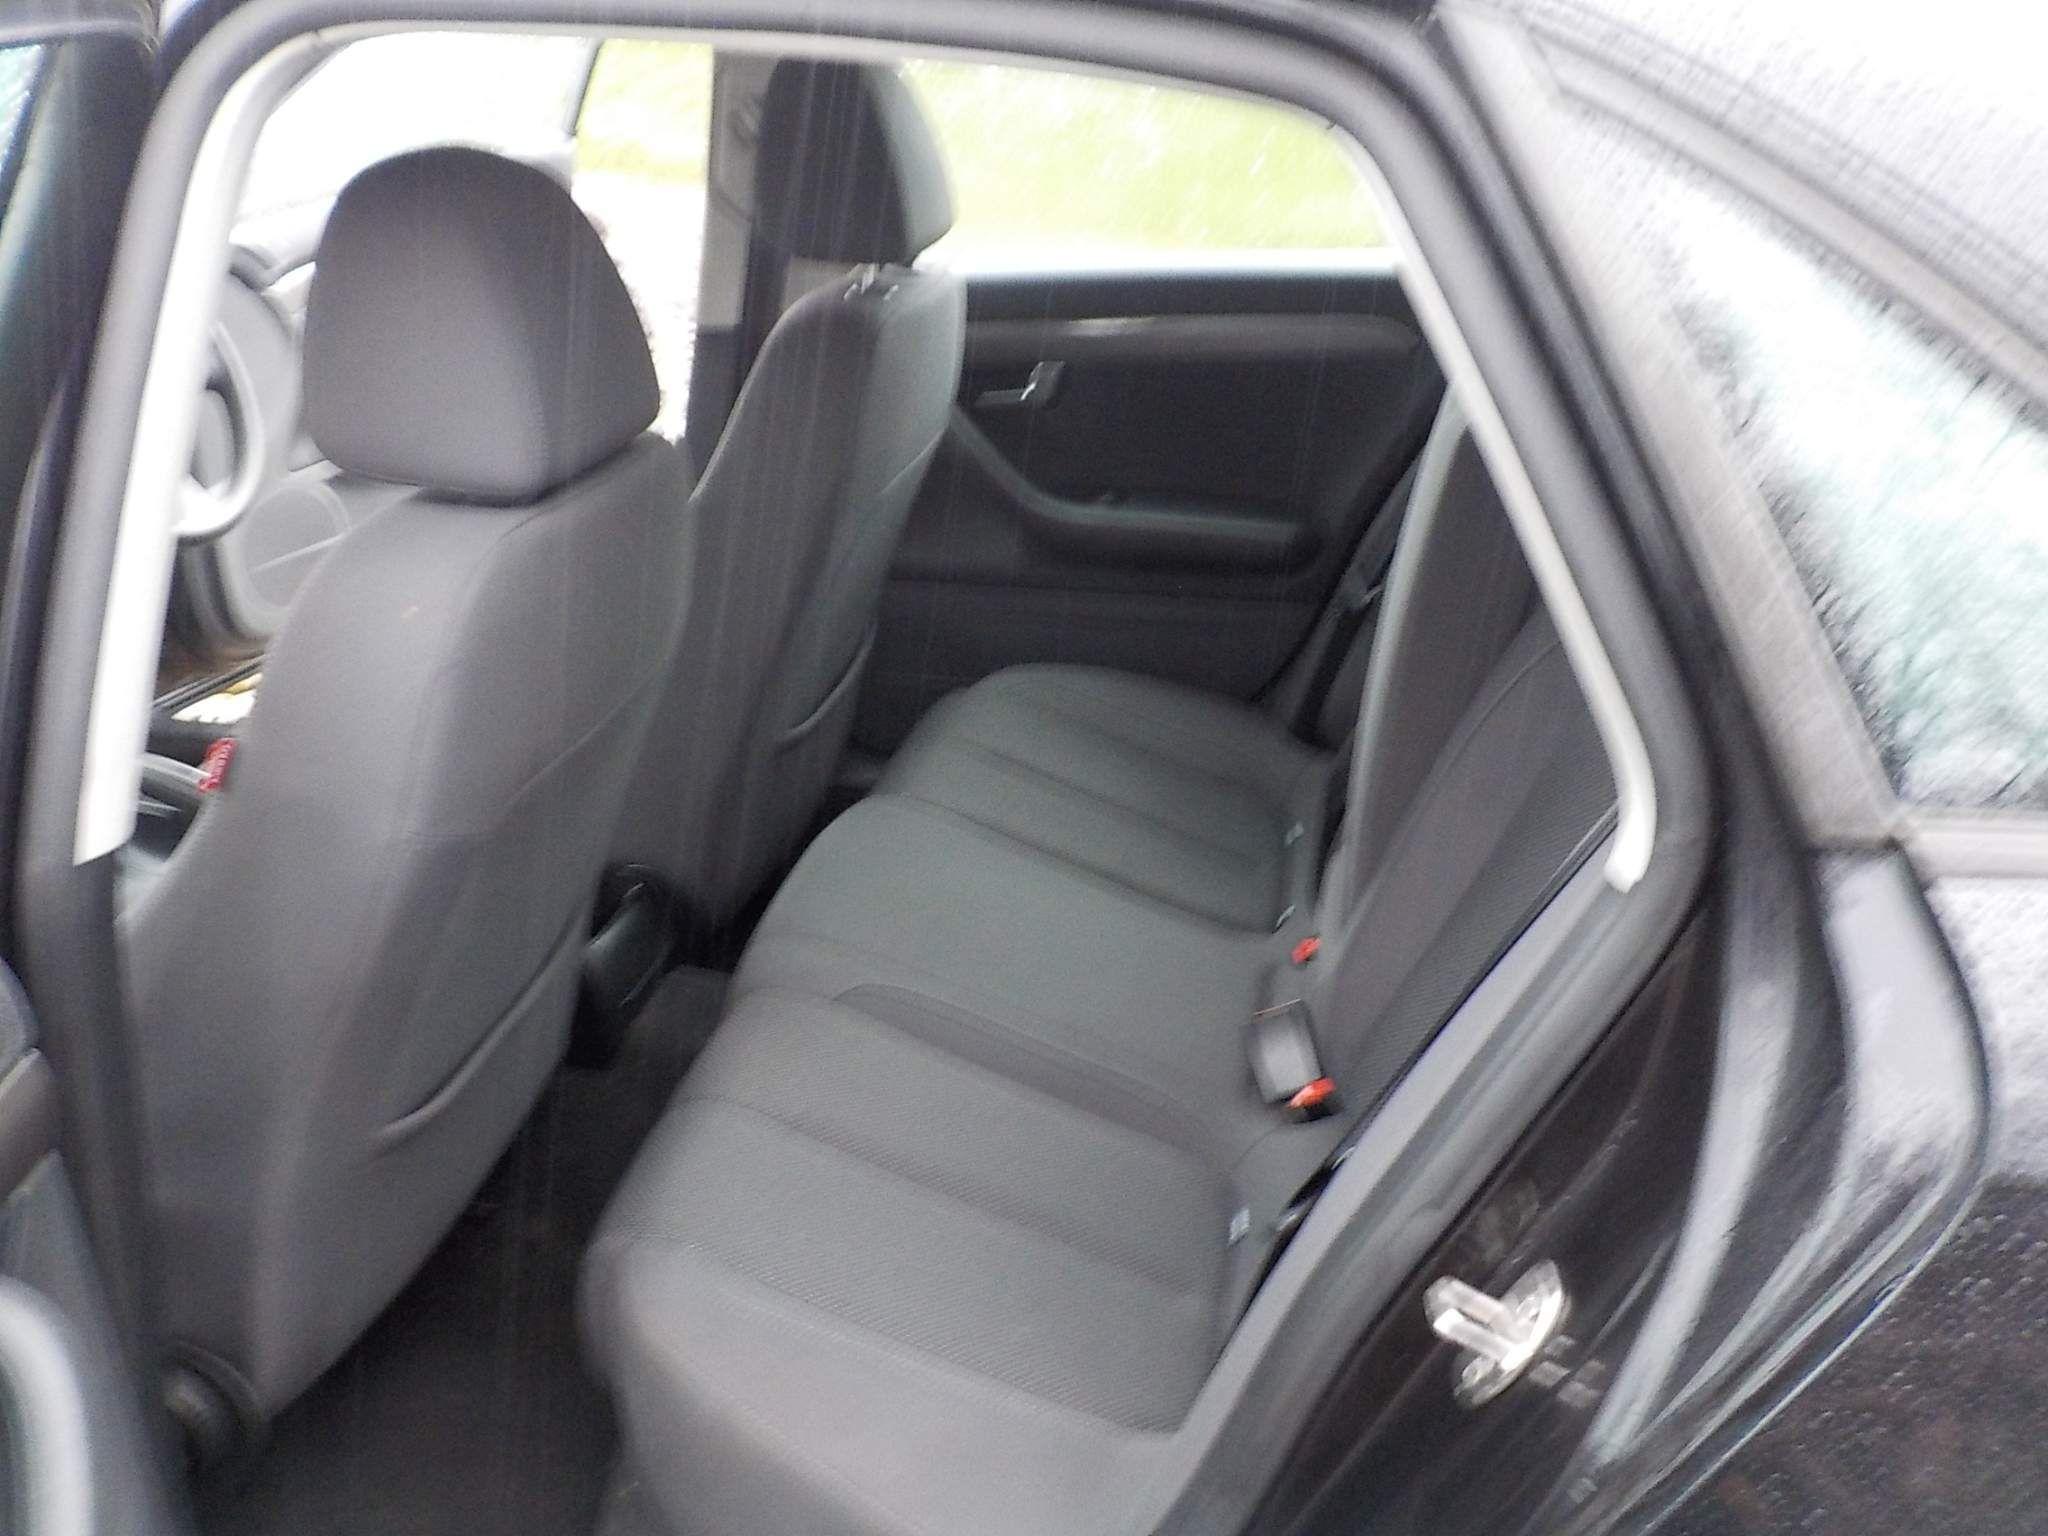 SEAT Exeo 2.0 TDI DPF S 4dr